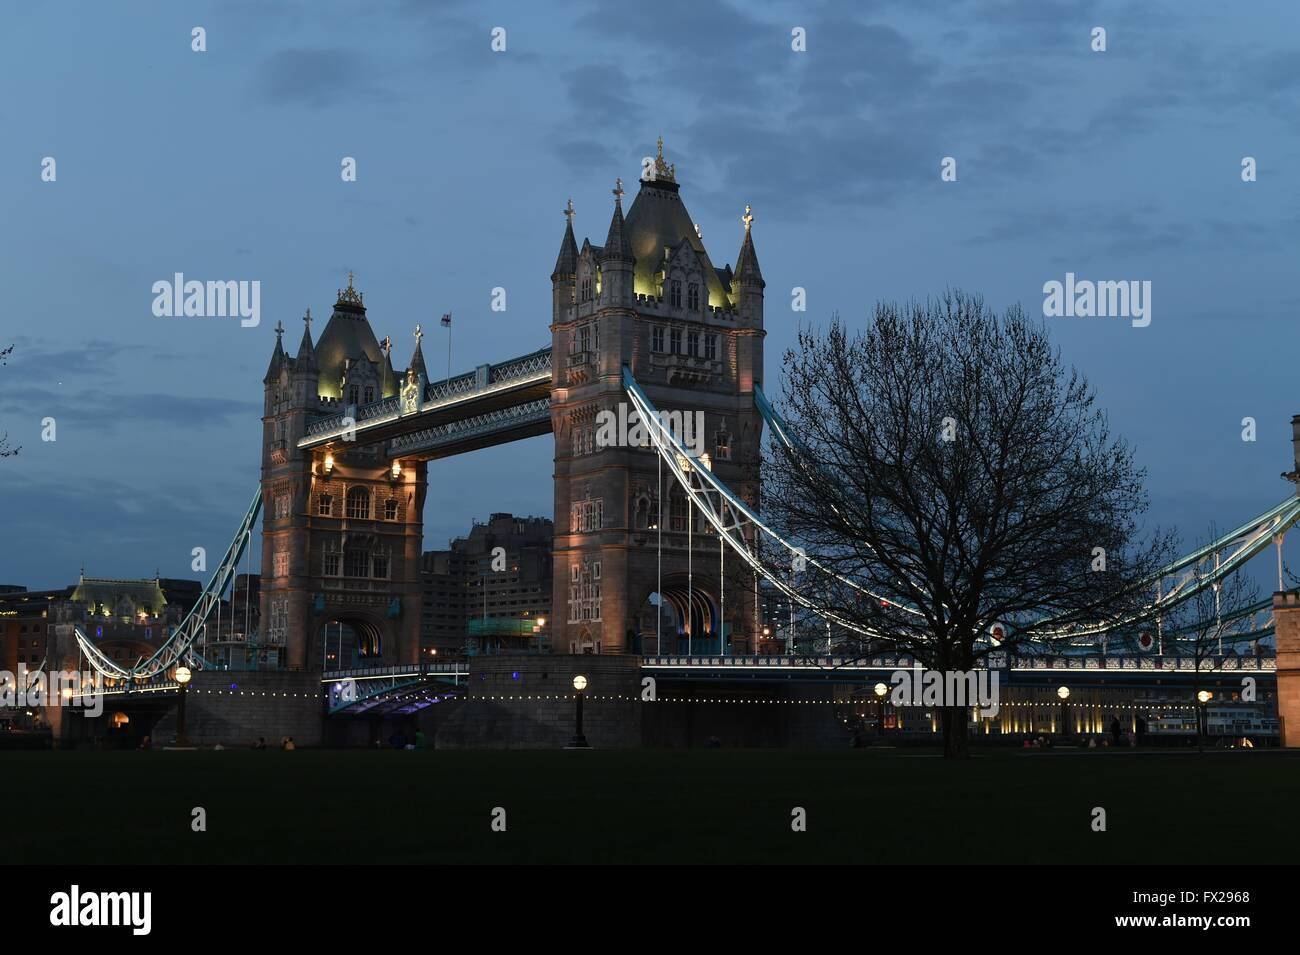 Thames Bridge, london - Stock Image